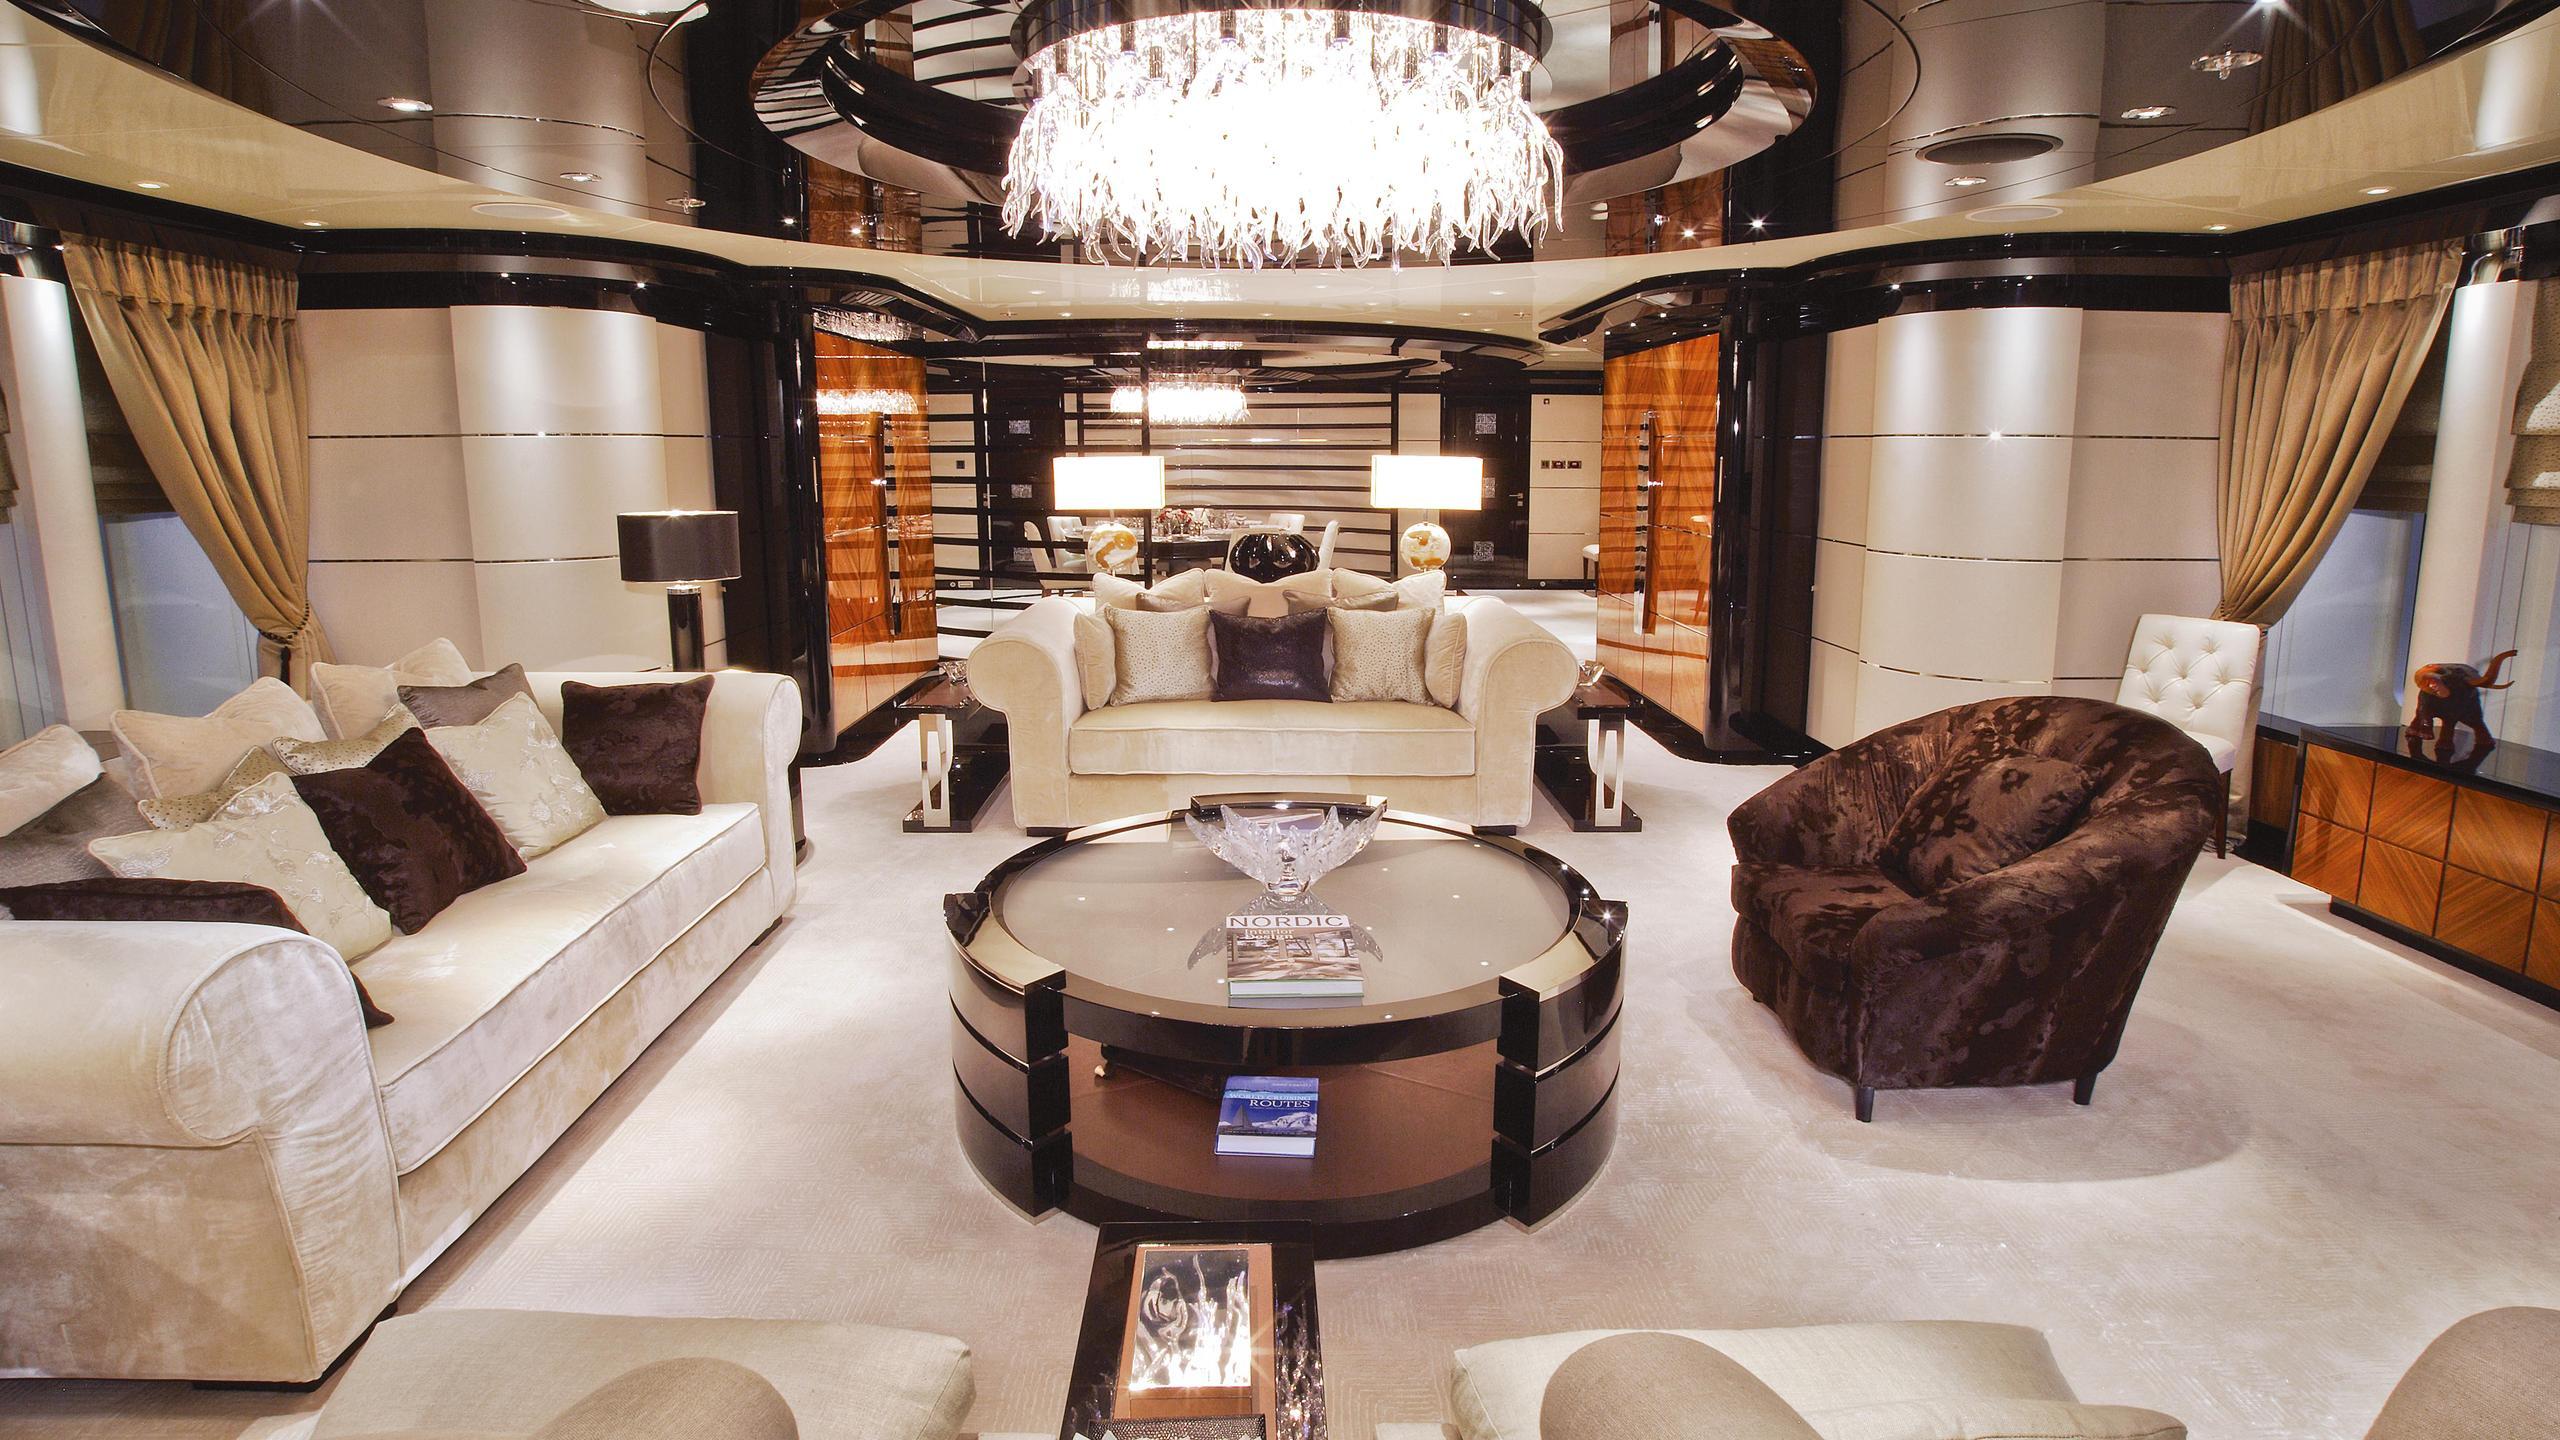 talisman-c-motor-yacht-Turquoise-2011-71m-main-saloon